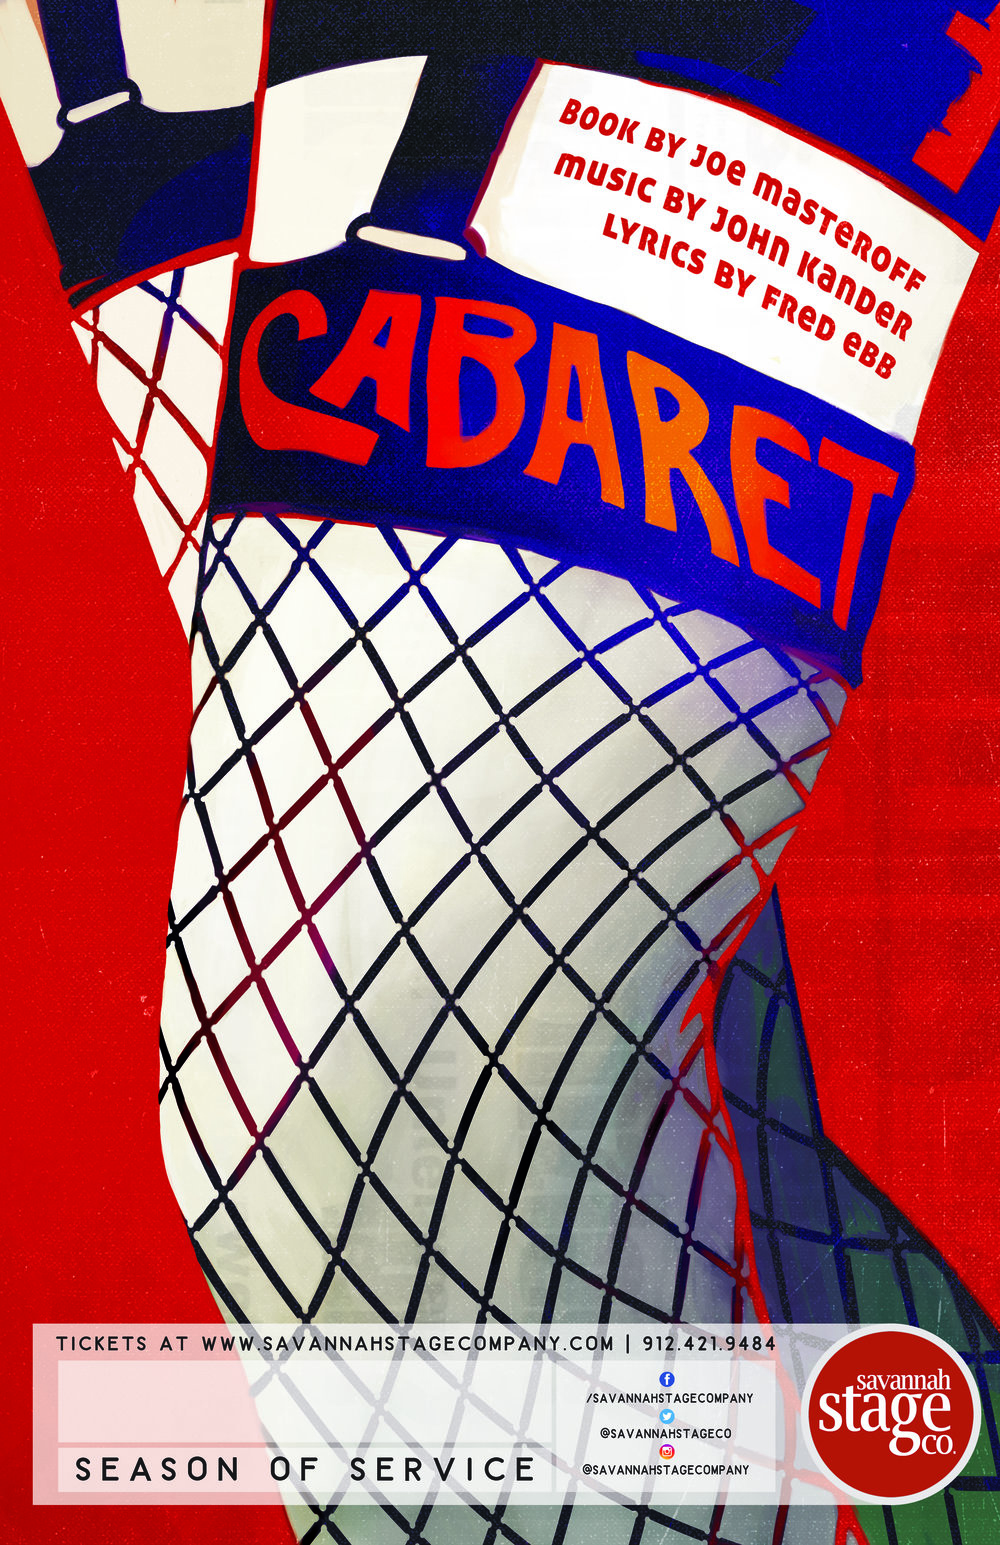 ssc_cabaret.jpg